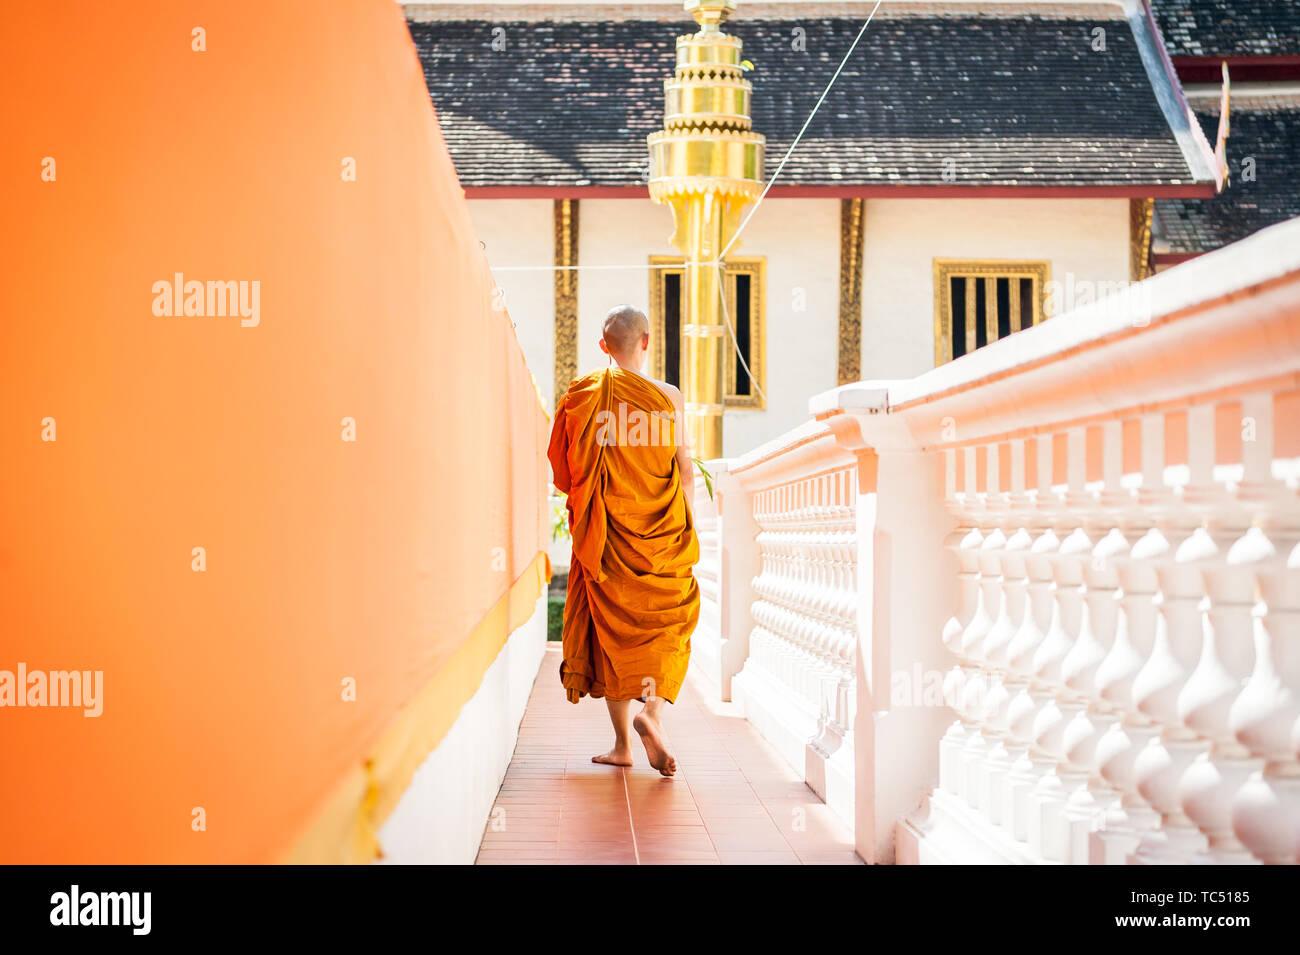 Wat Phra Singh Woramahavikarn Buddhist Temple Chiang Mai Thailand Stock Photo